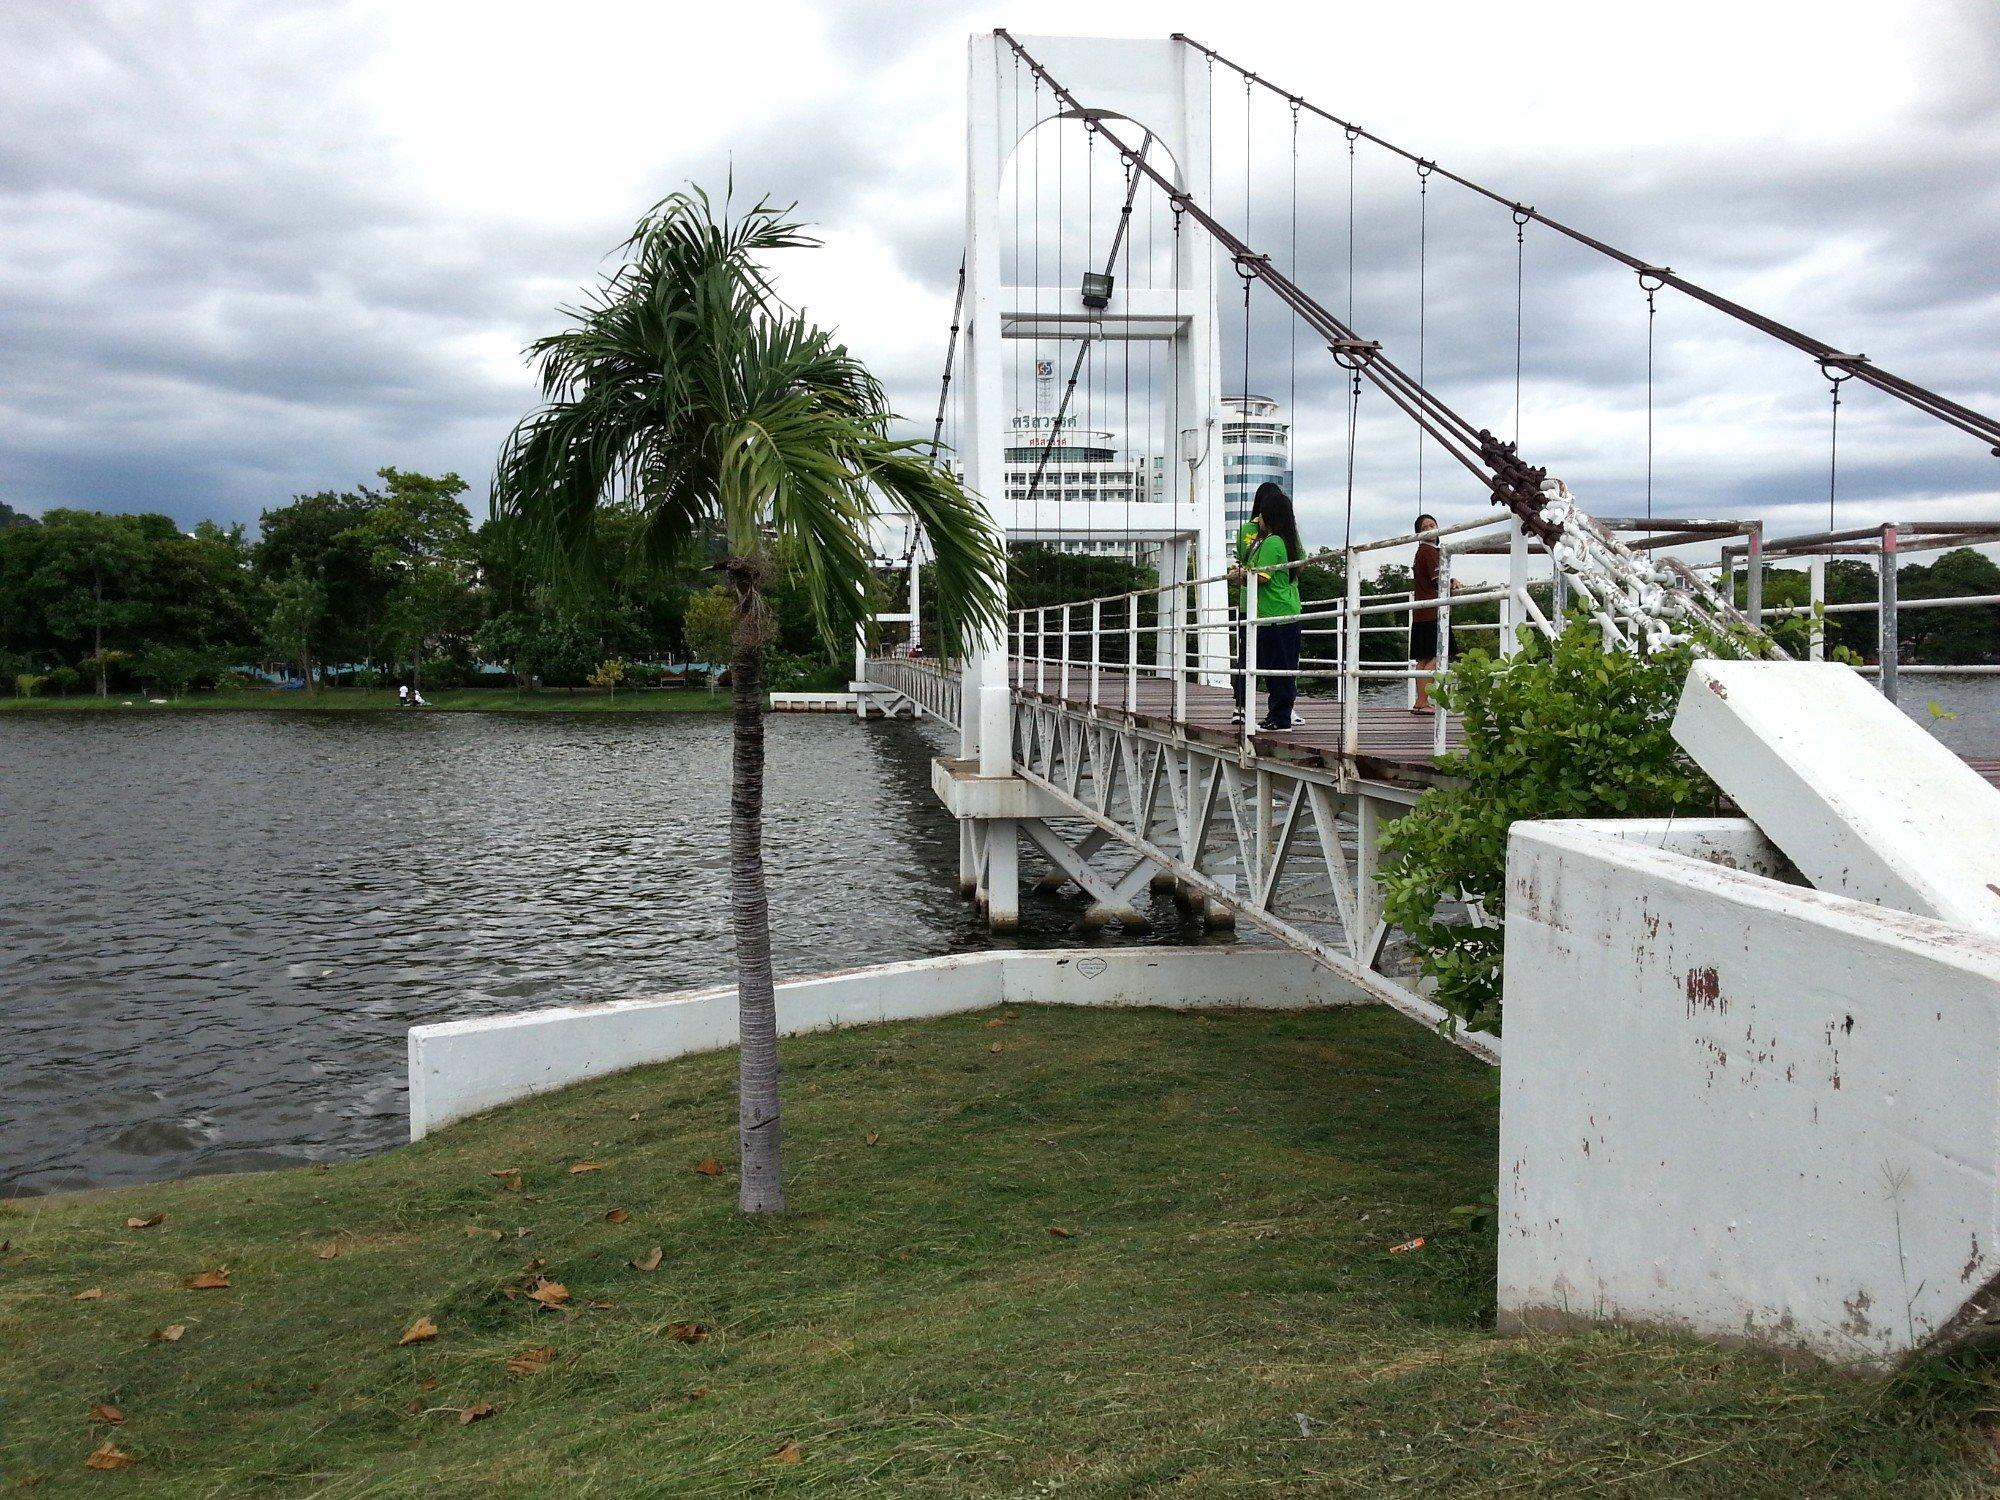 Paradise Park in Nakhon Sawan